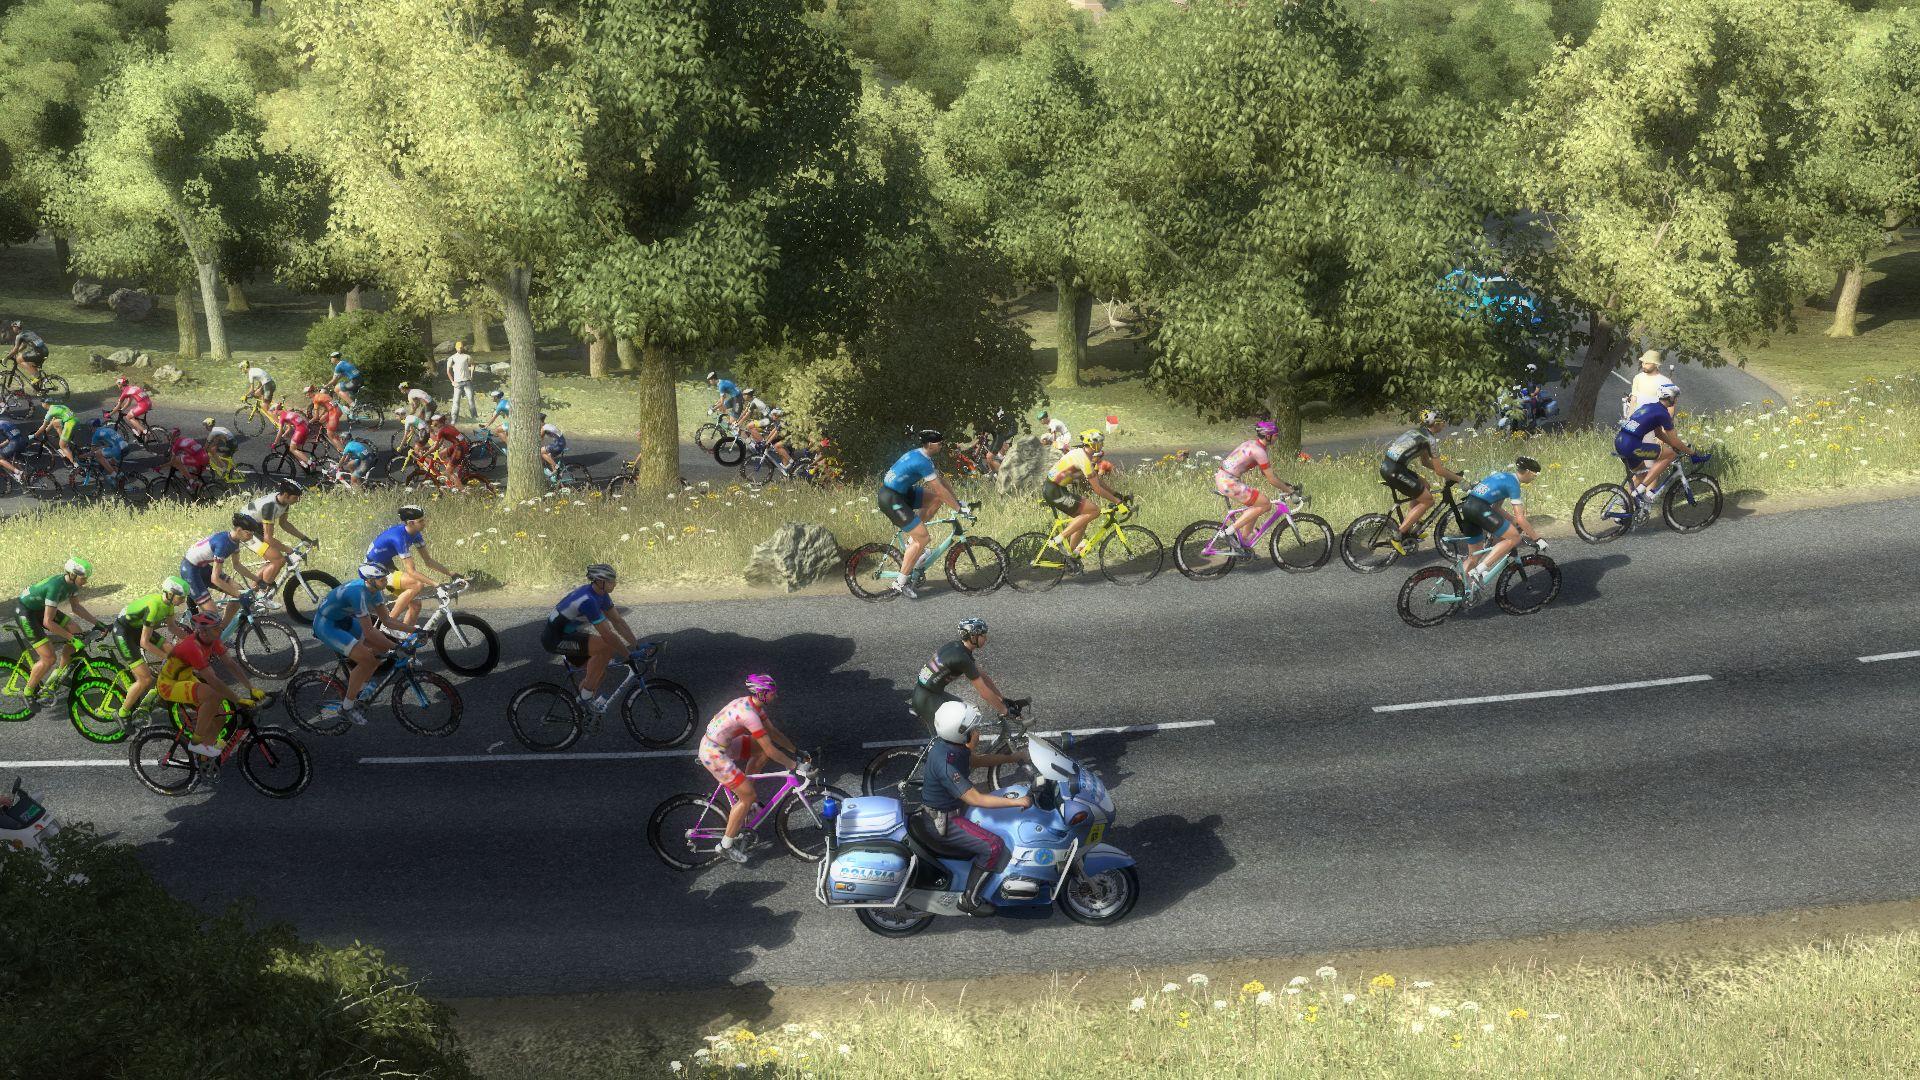 pcmdaily.com/images/mg/2019/Races/PT/Tirreno/mg19_ta_s07_03.jpg